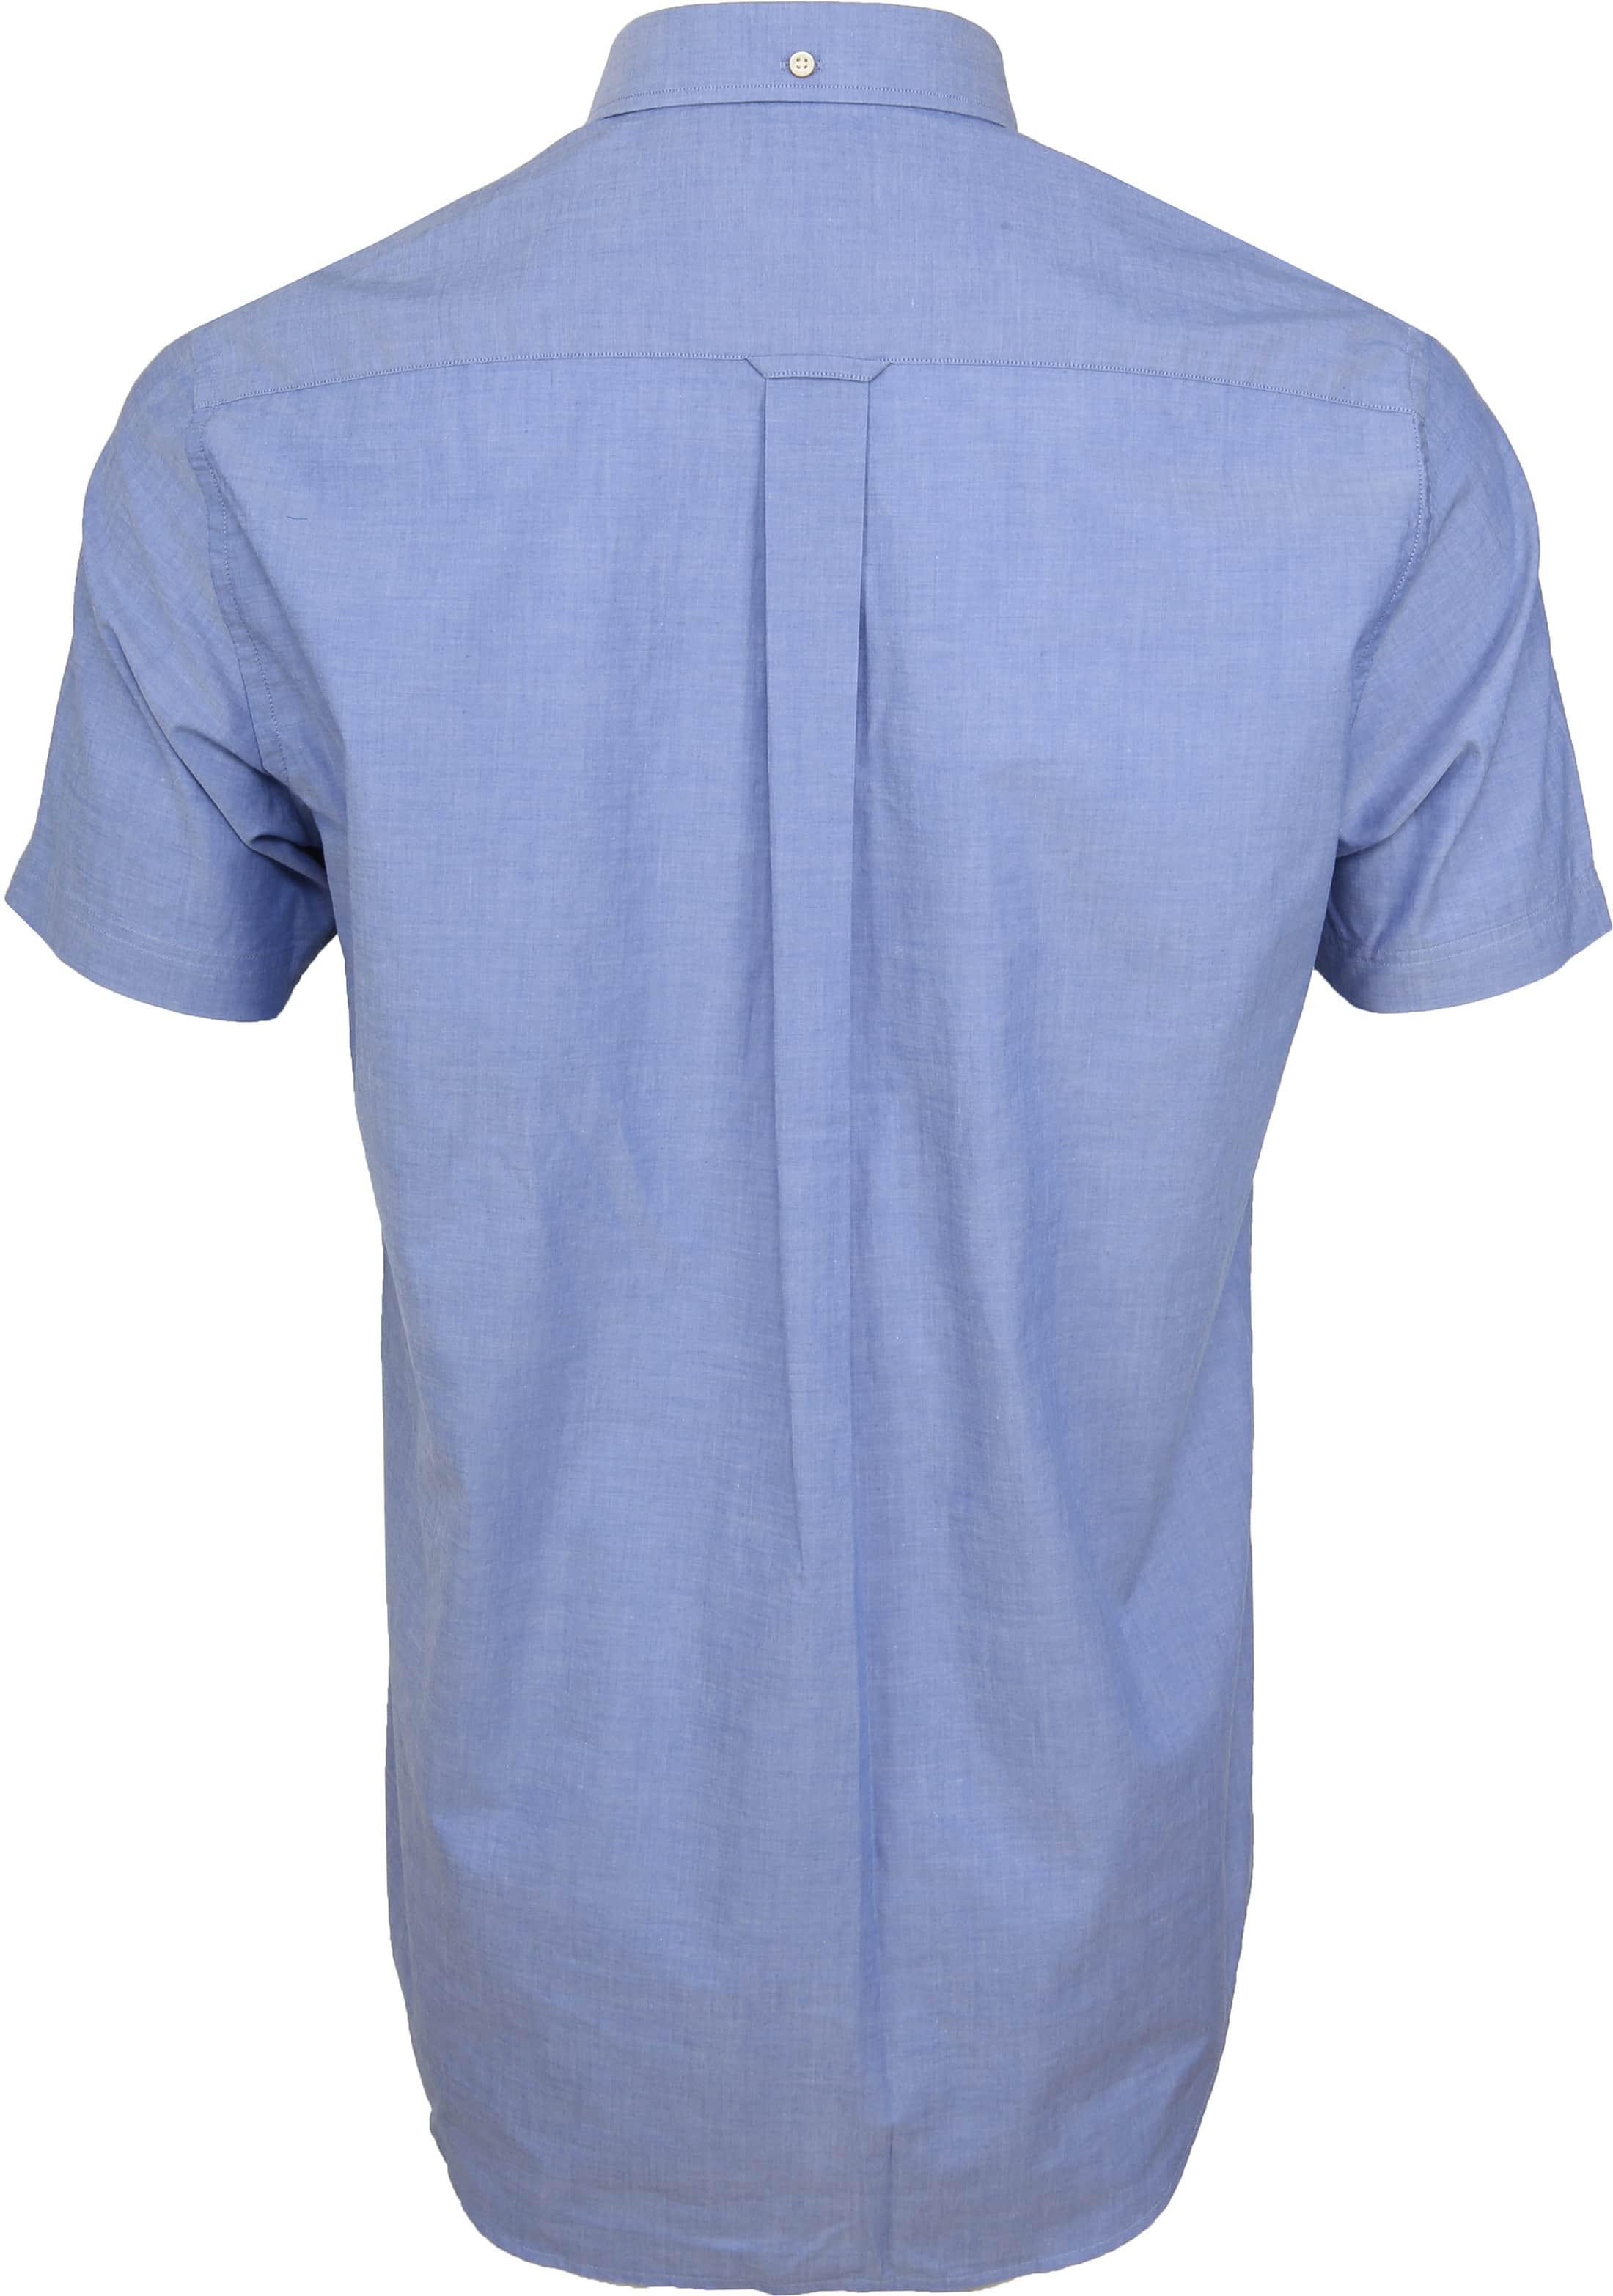 Gant Overhemd SS Broadcloth Blauw foto 3